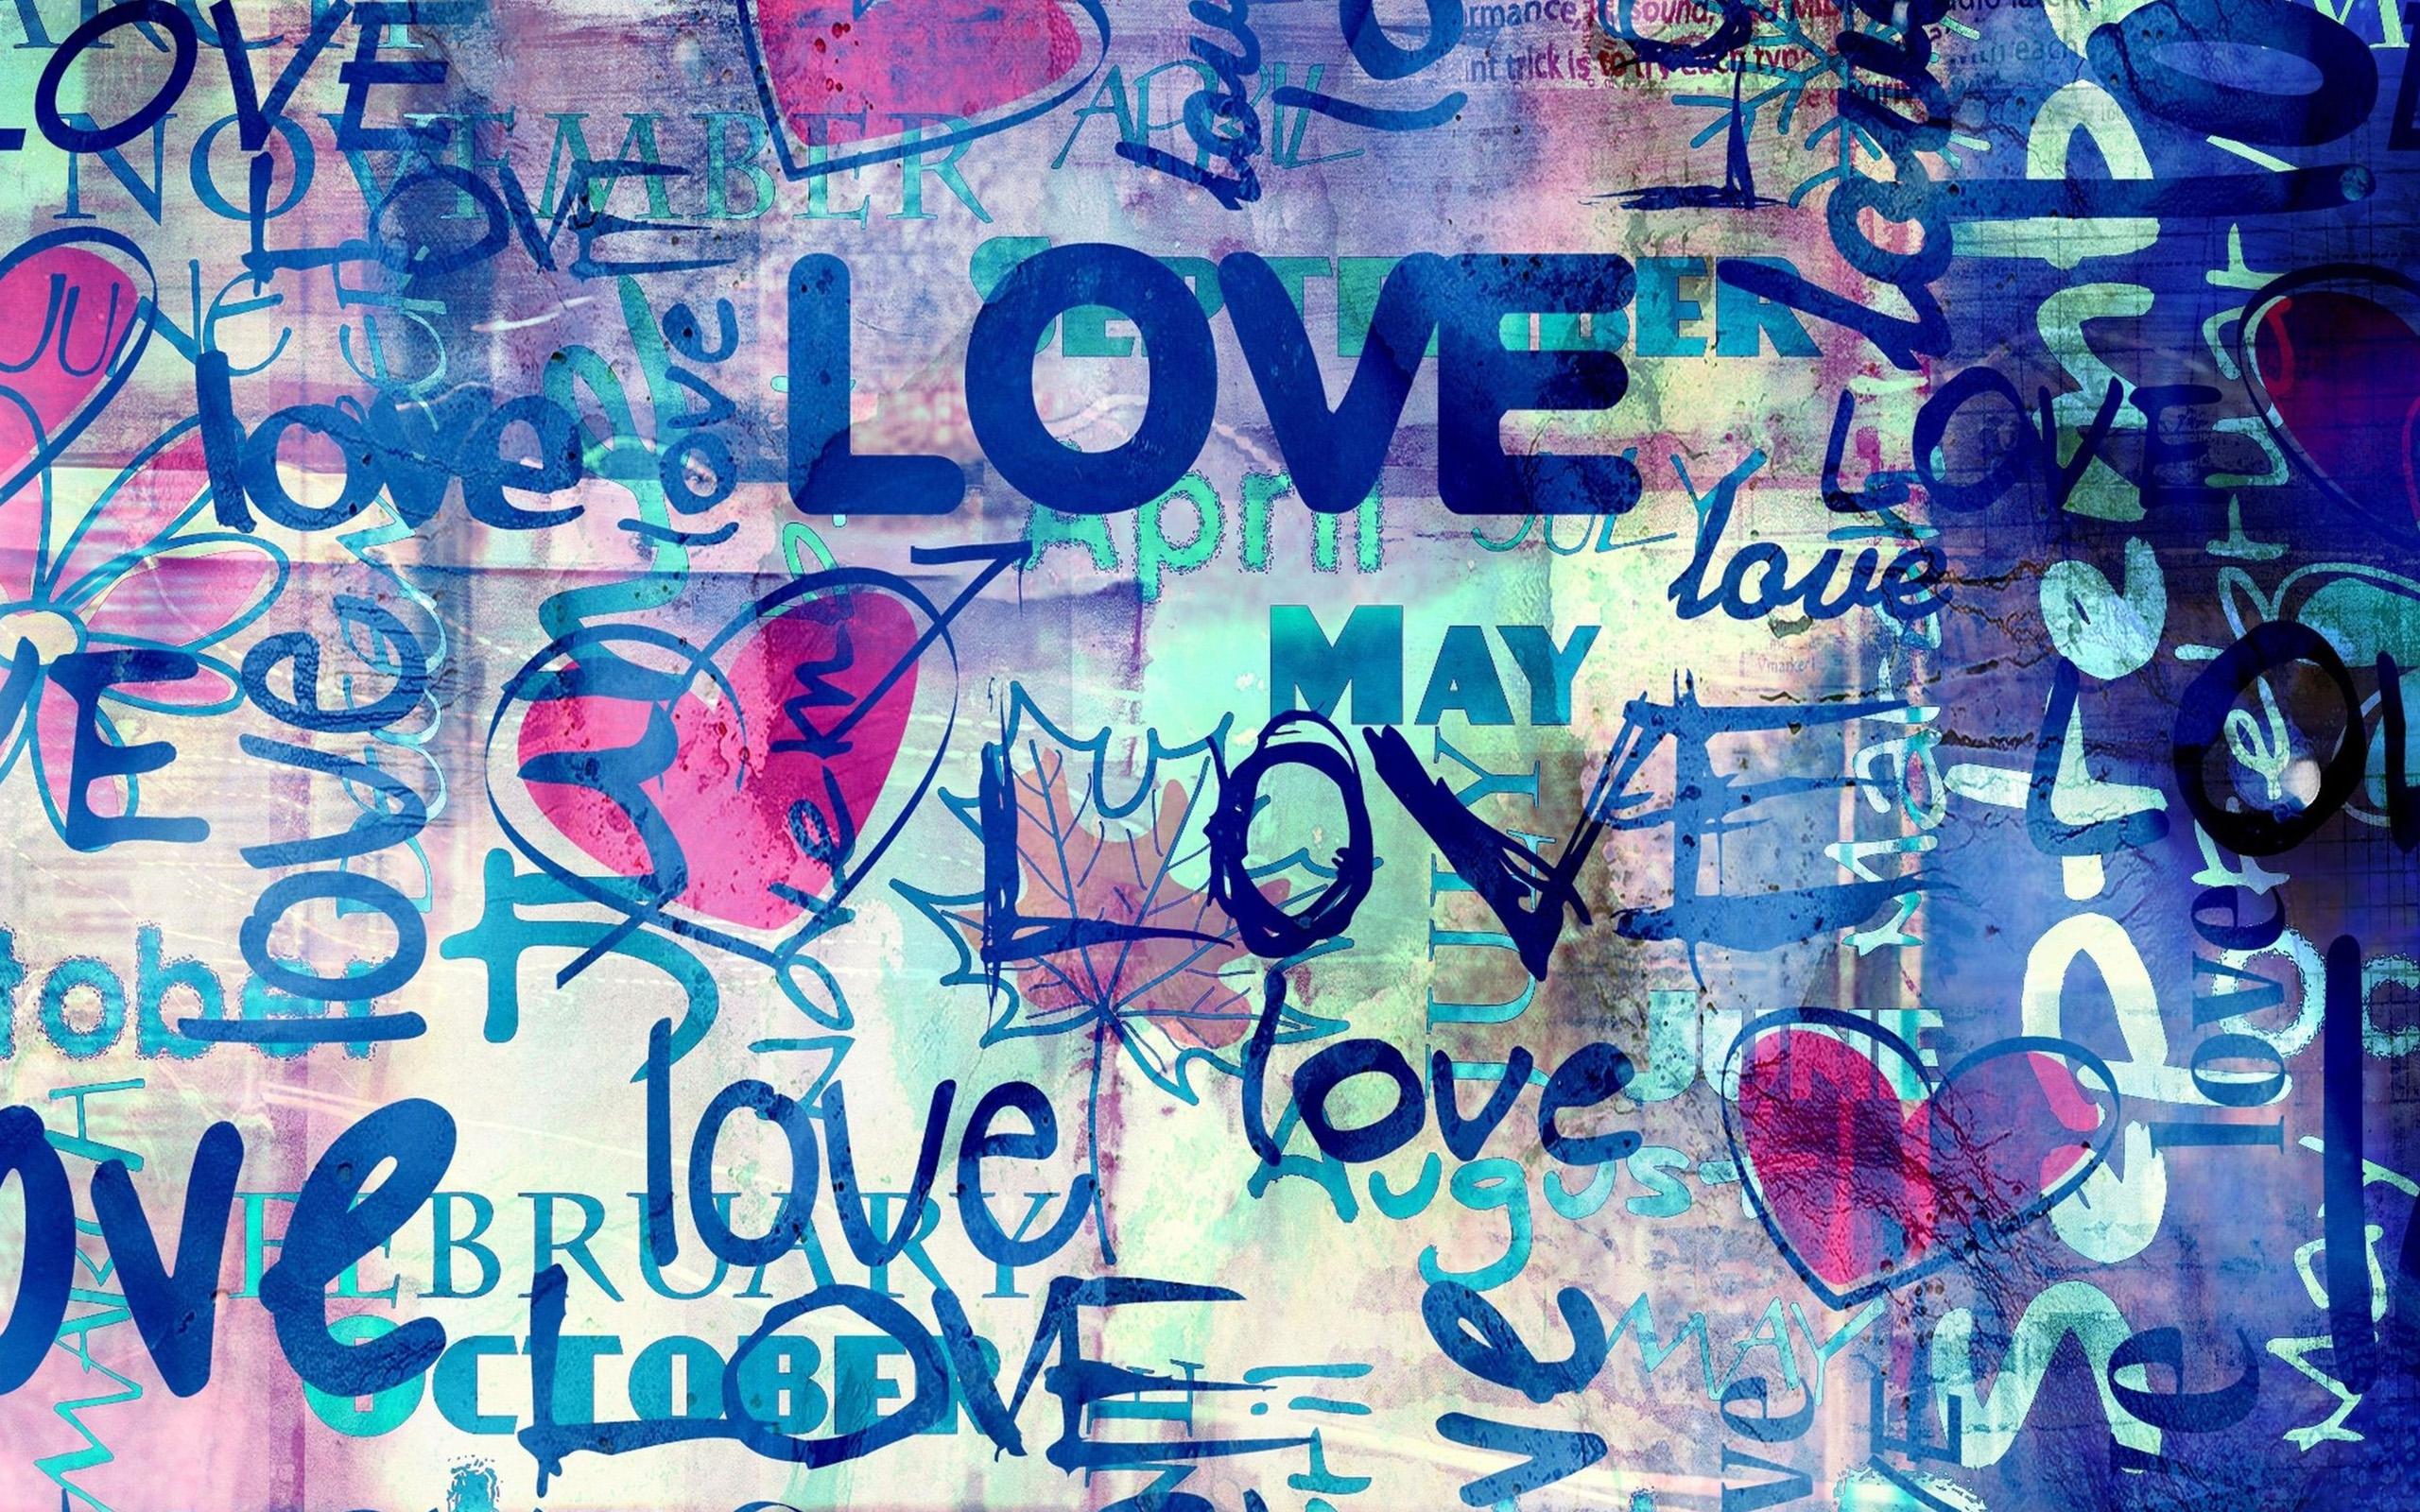 Fonds d 39 cran graffiti hd - J love wallpaper download ...